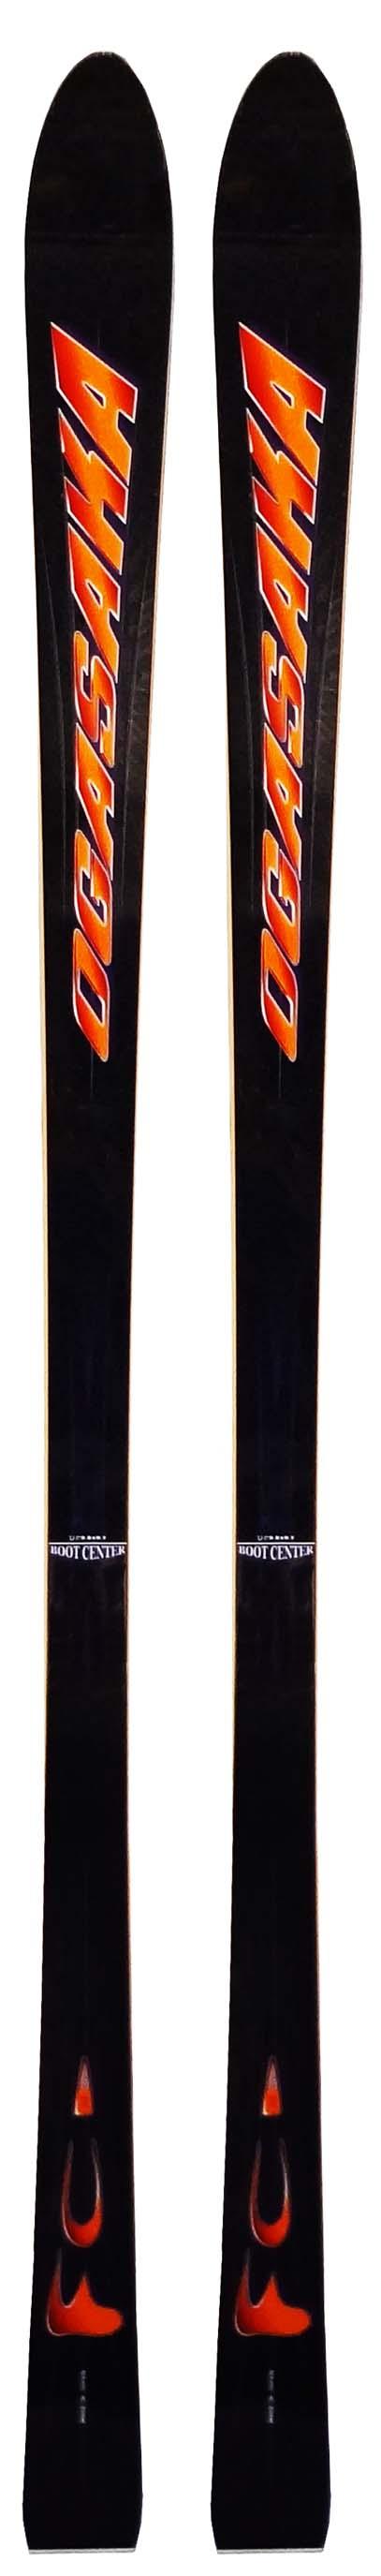 Ogasaka 00 - 01 FC Black Skis (No Bindings / Flat) NEW !!  175,180cm